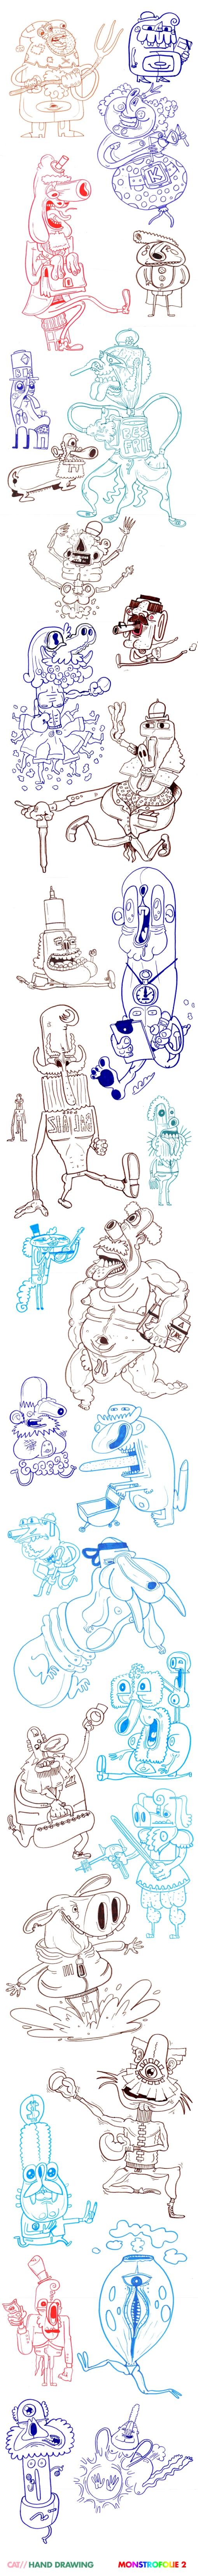 monstrofolie2